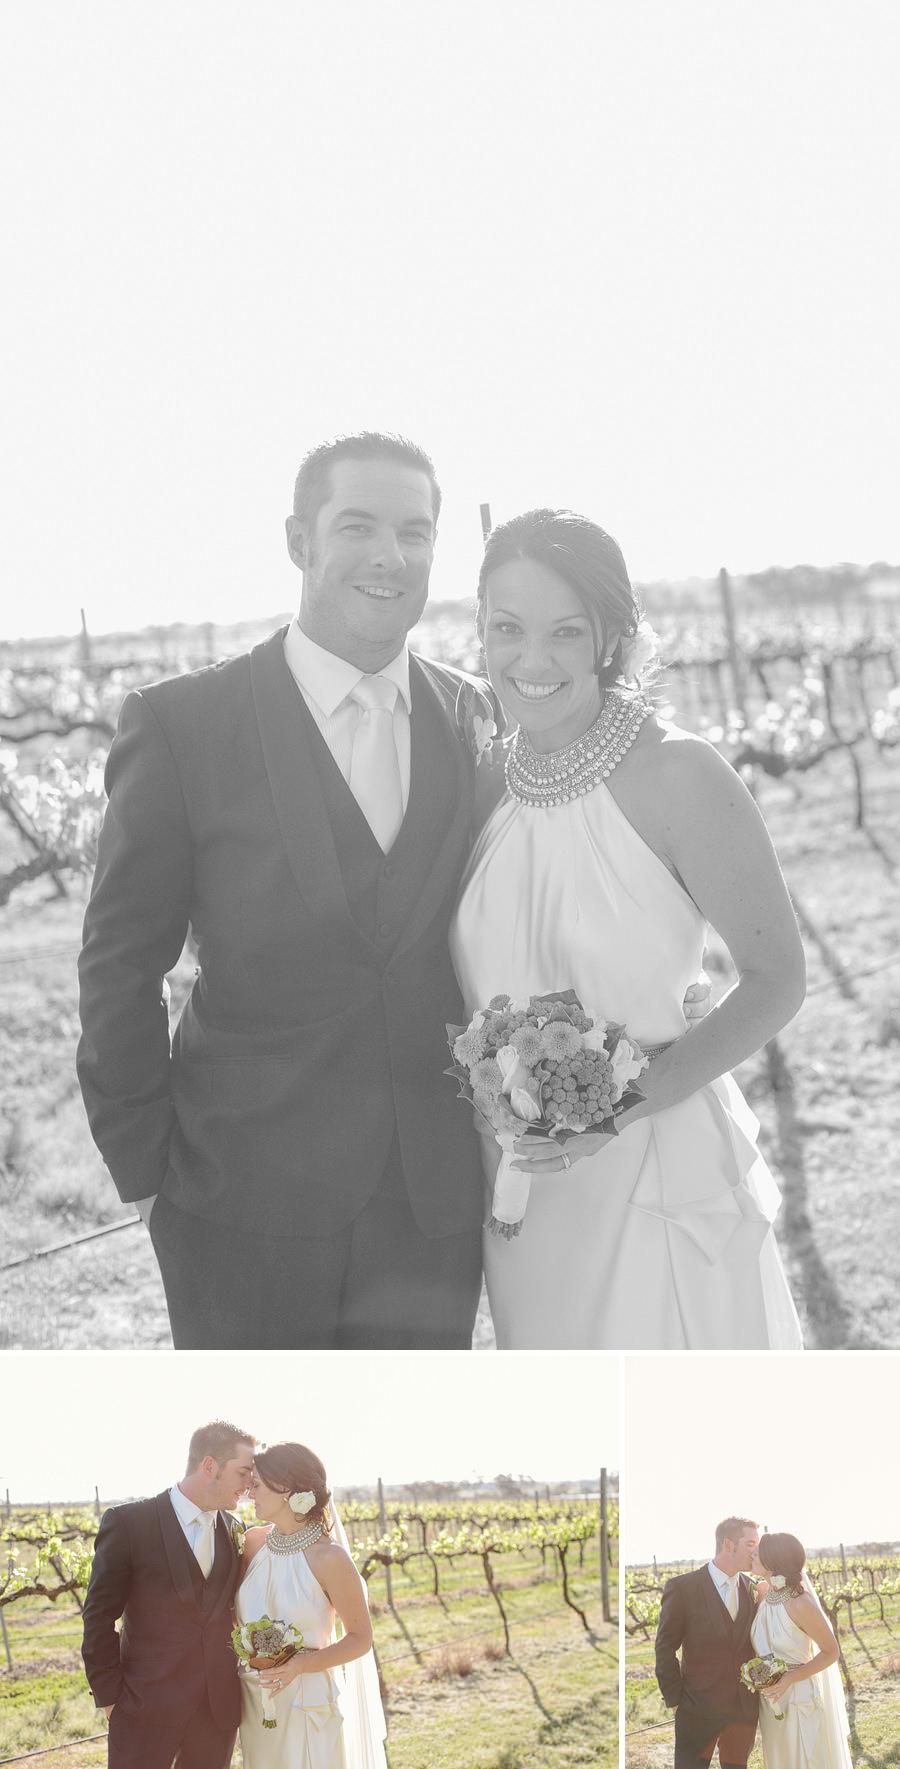 Monument Vineyard Millthorpe Wedding Photographers: Bridal Party Portraits